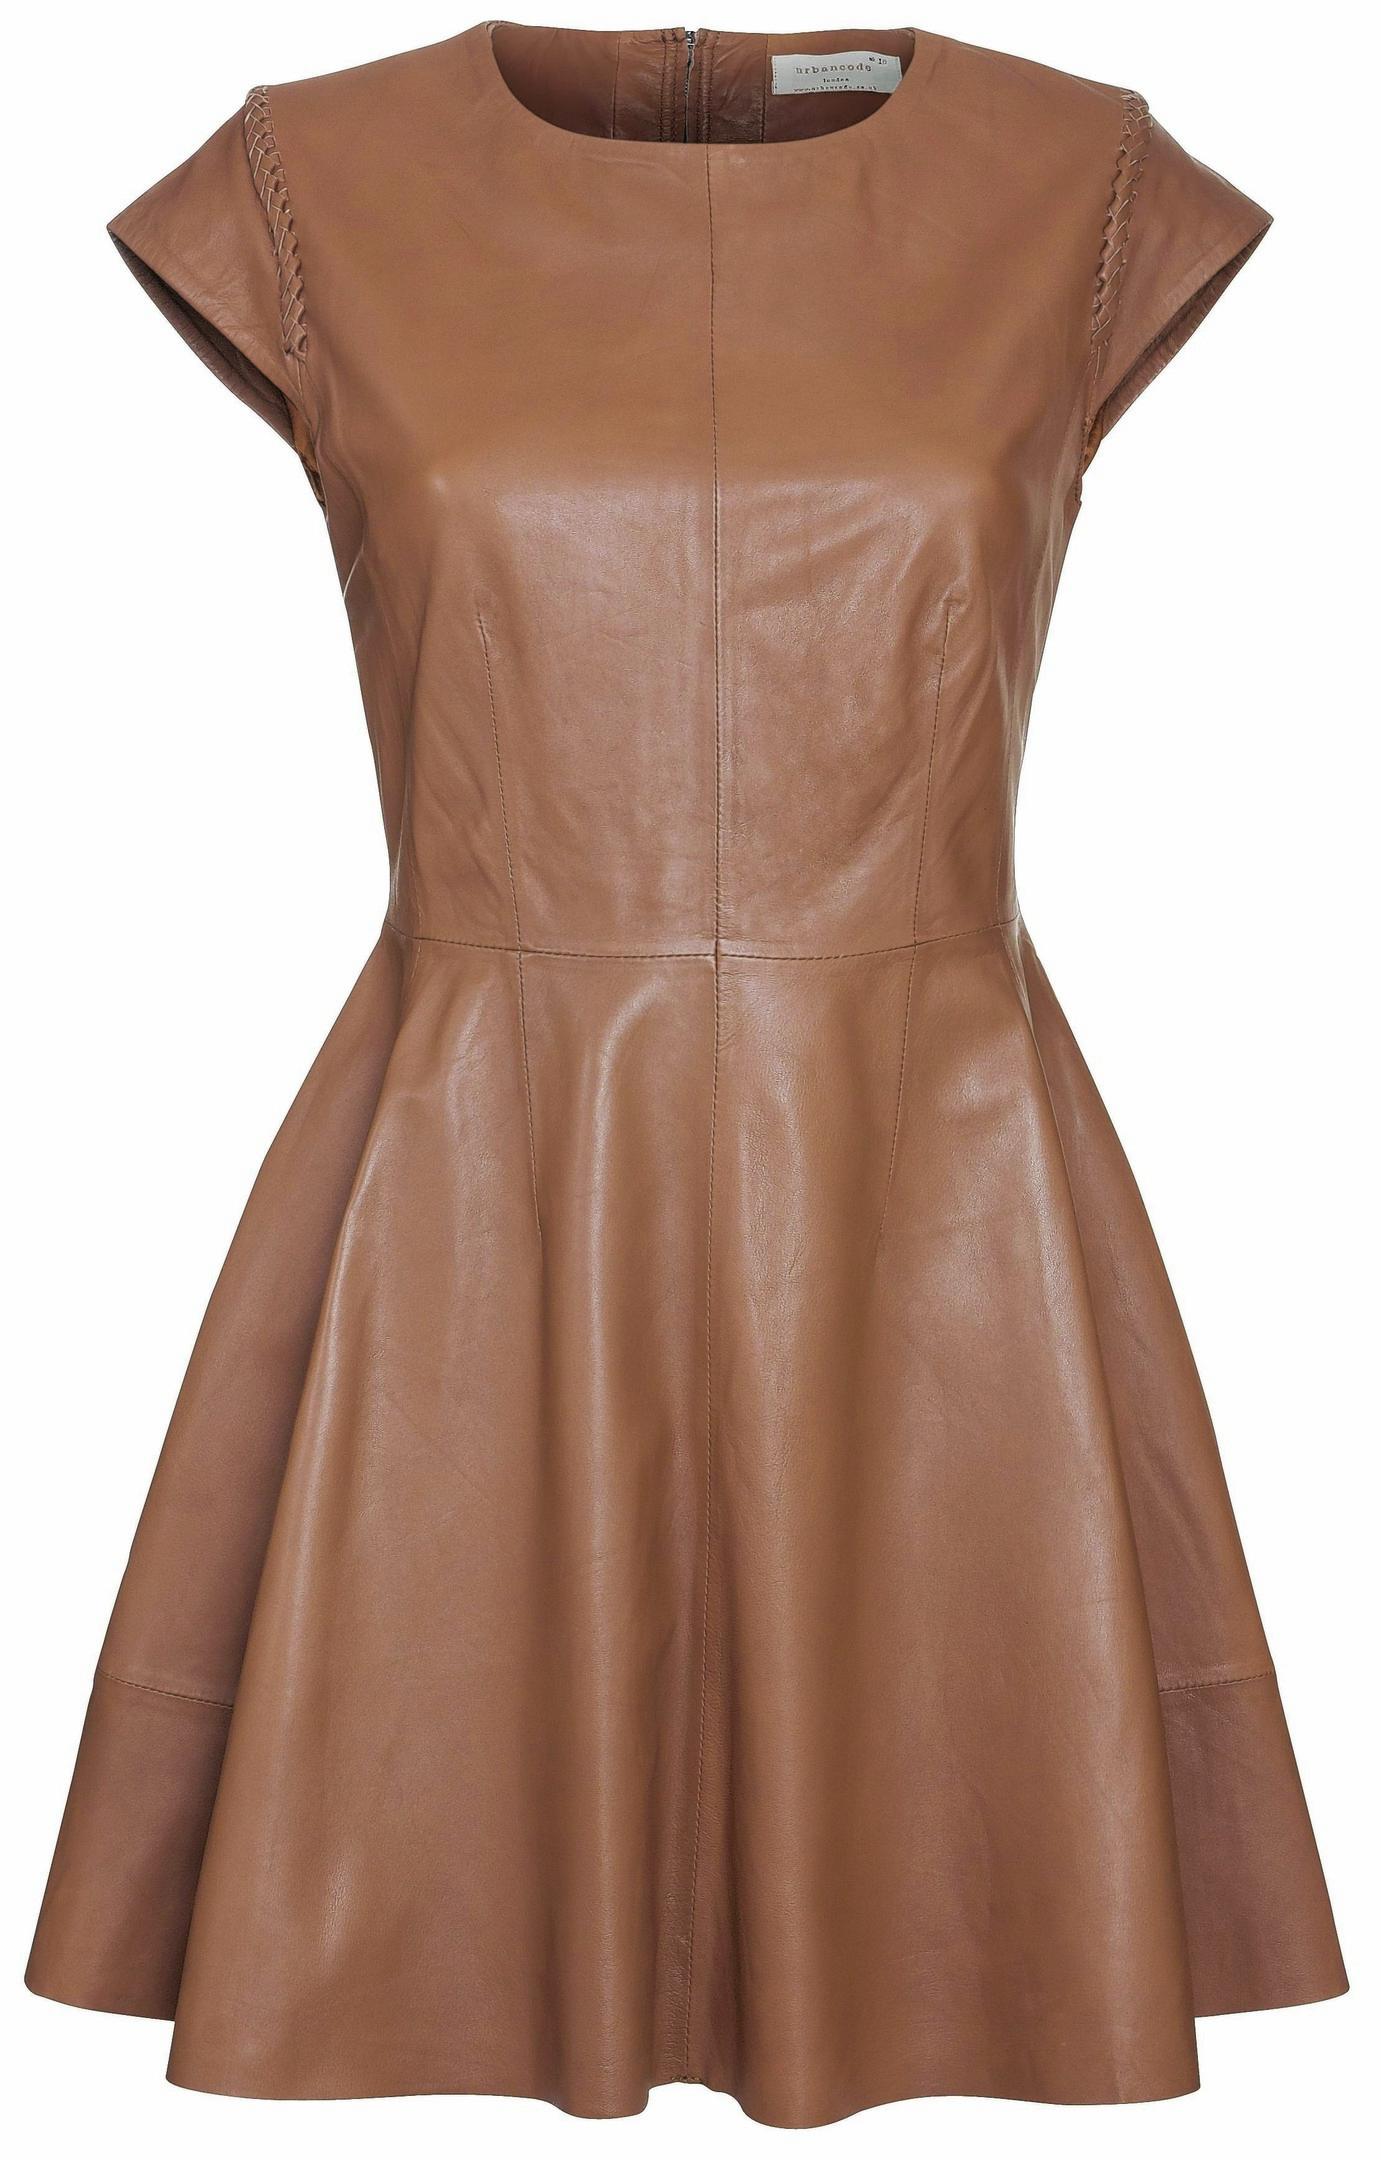 Urbancode Flaire leather dress in Bambi, www.urbancode.co.uk.